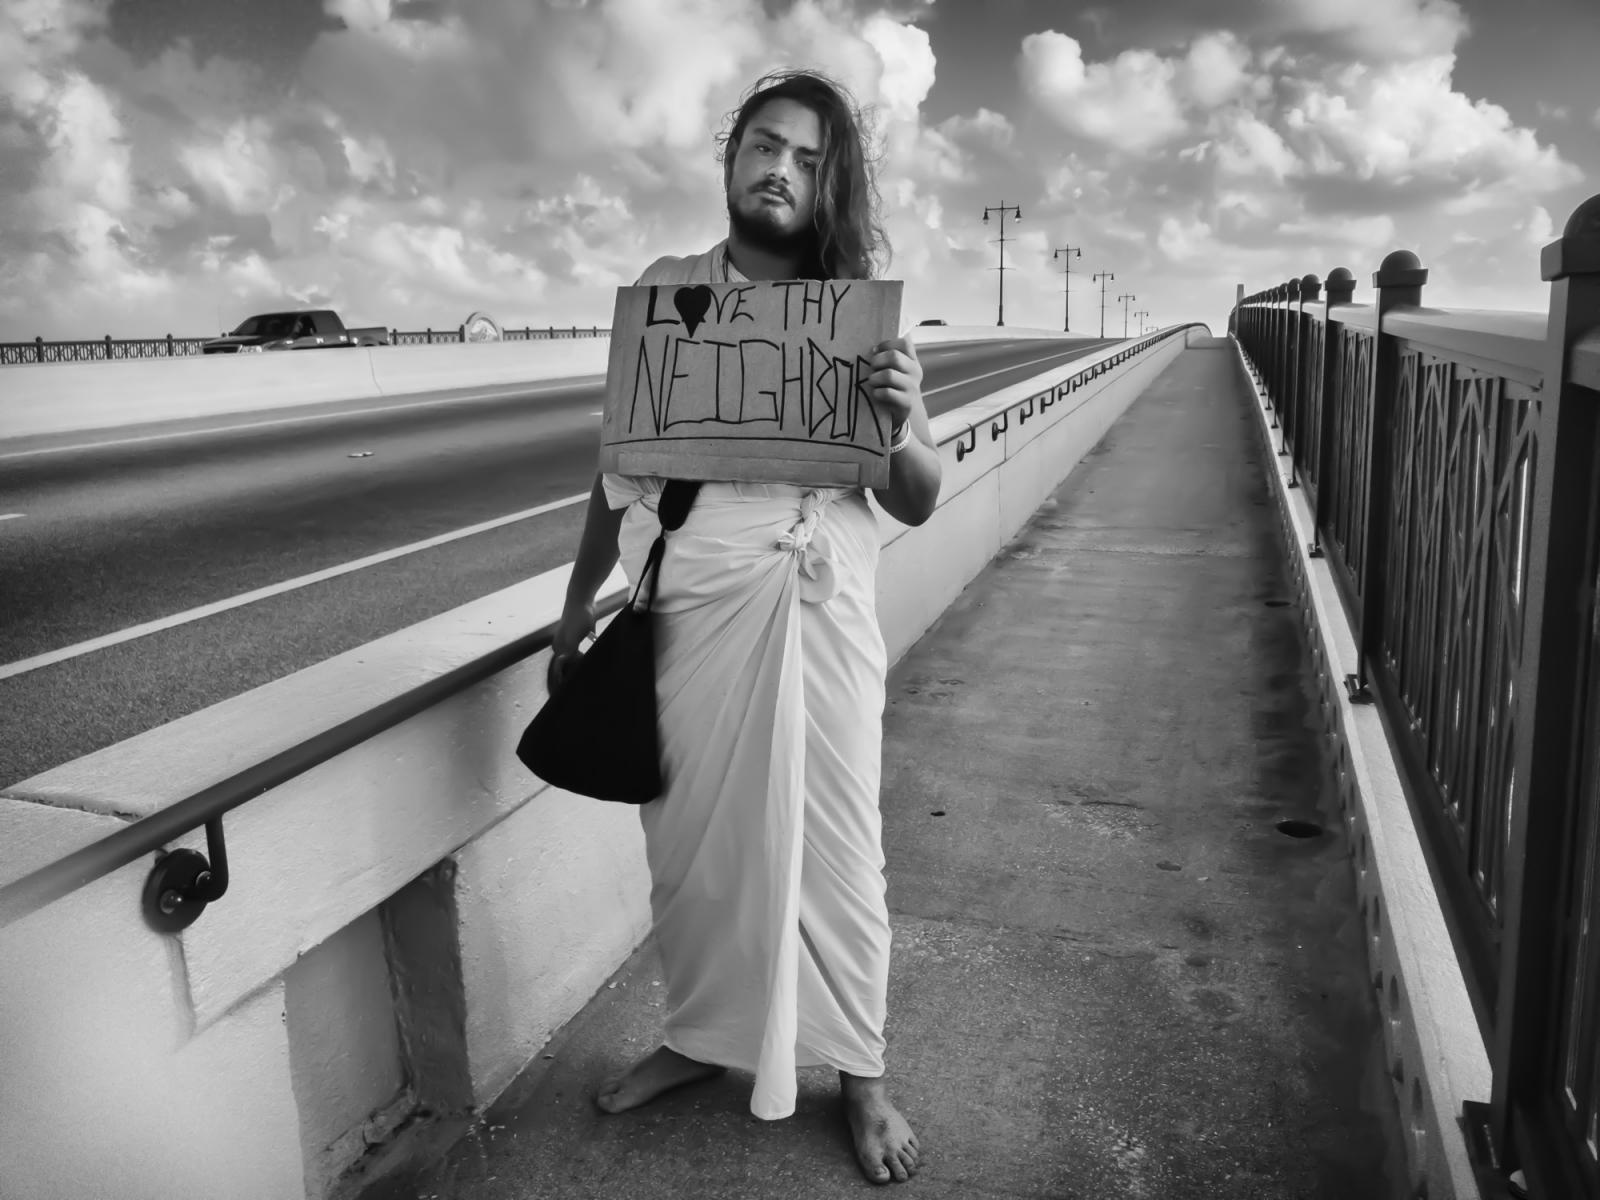 International Speedway Bridge, Daytona Beach, FL